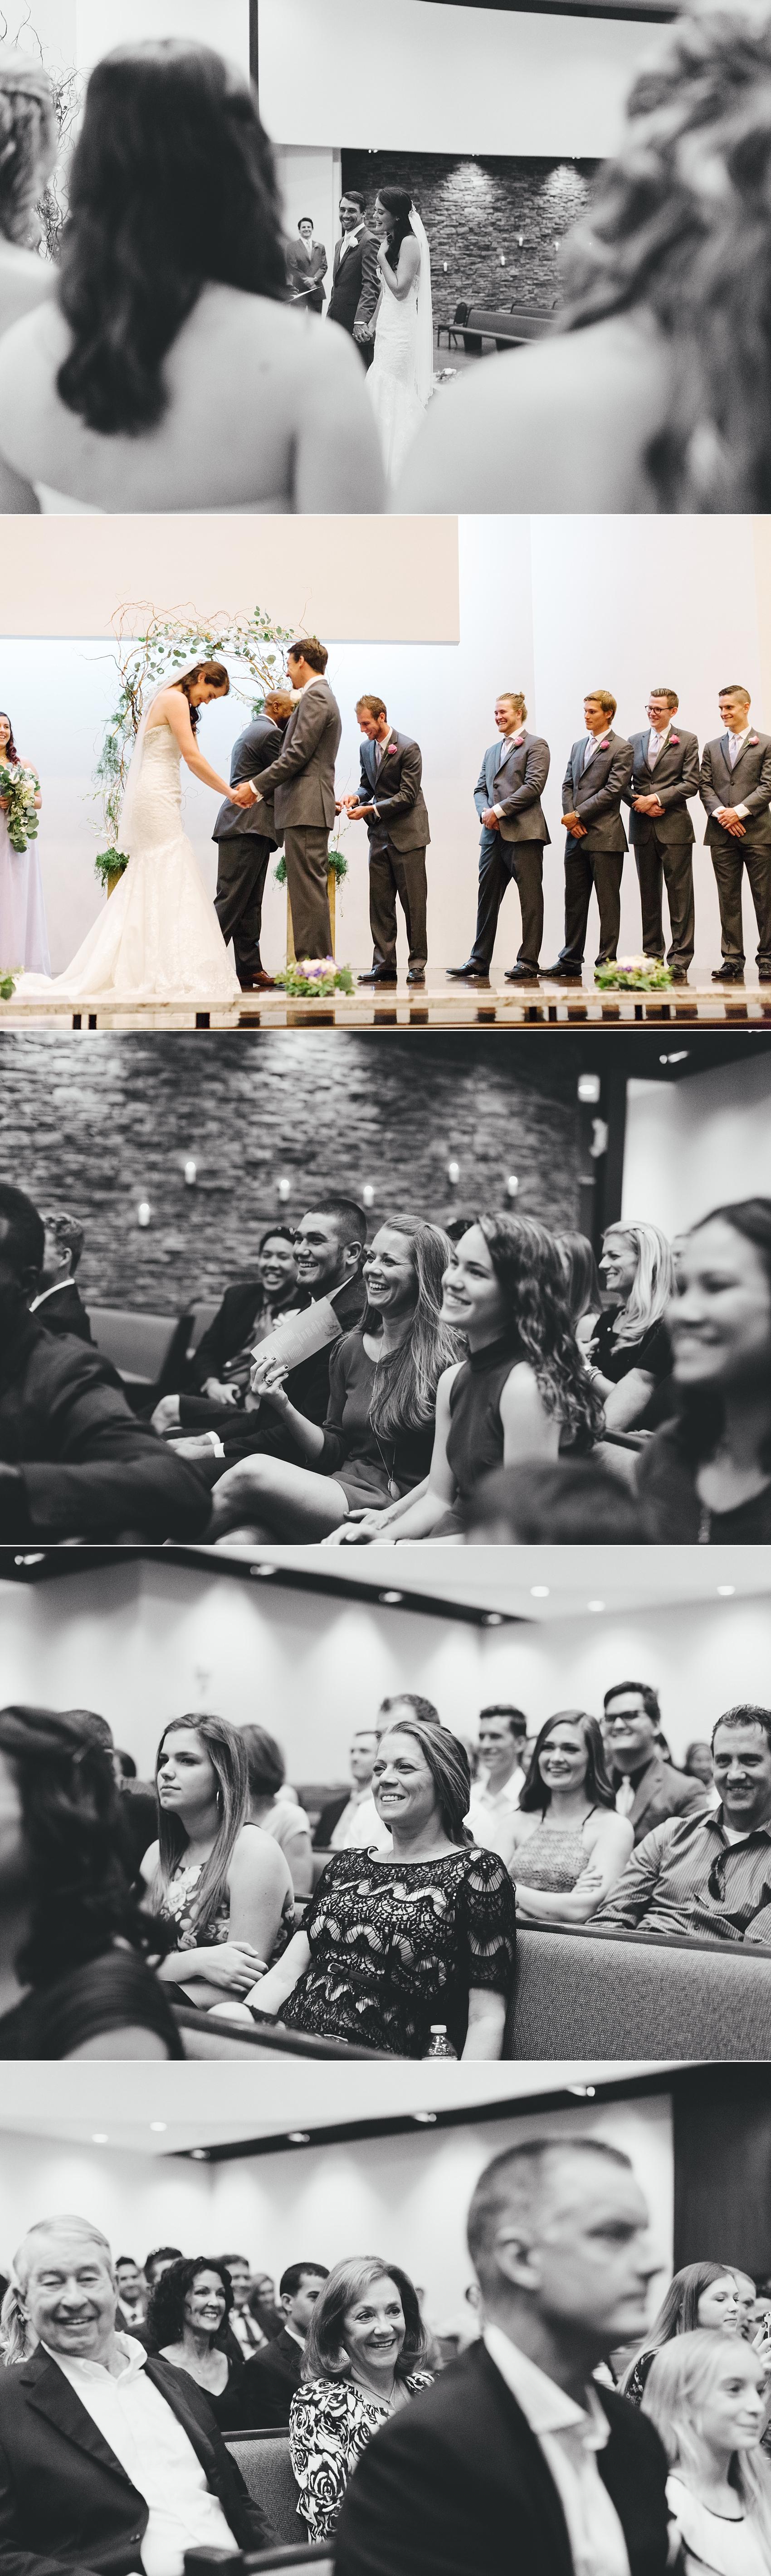 wa wedding blog-32.jpg